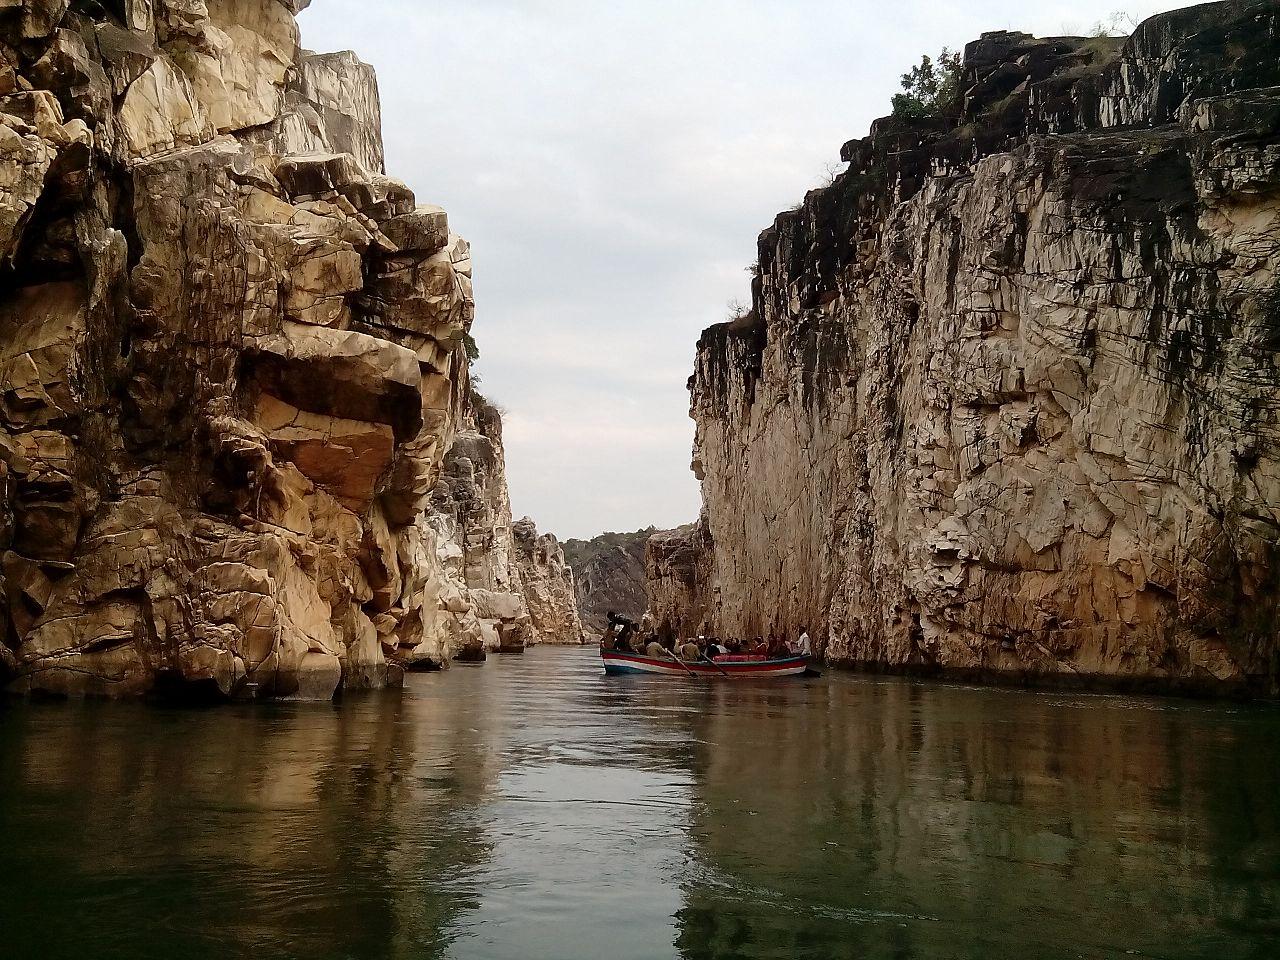 File:Marble Rocks, narmada river, jabalpur.jpg - Wikimedia ...